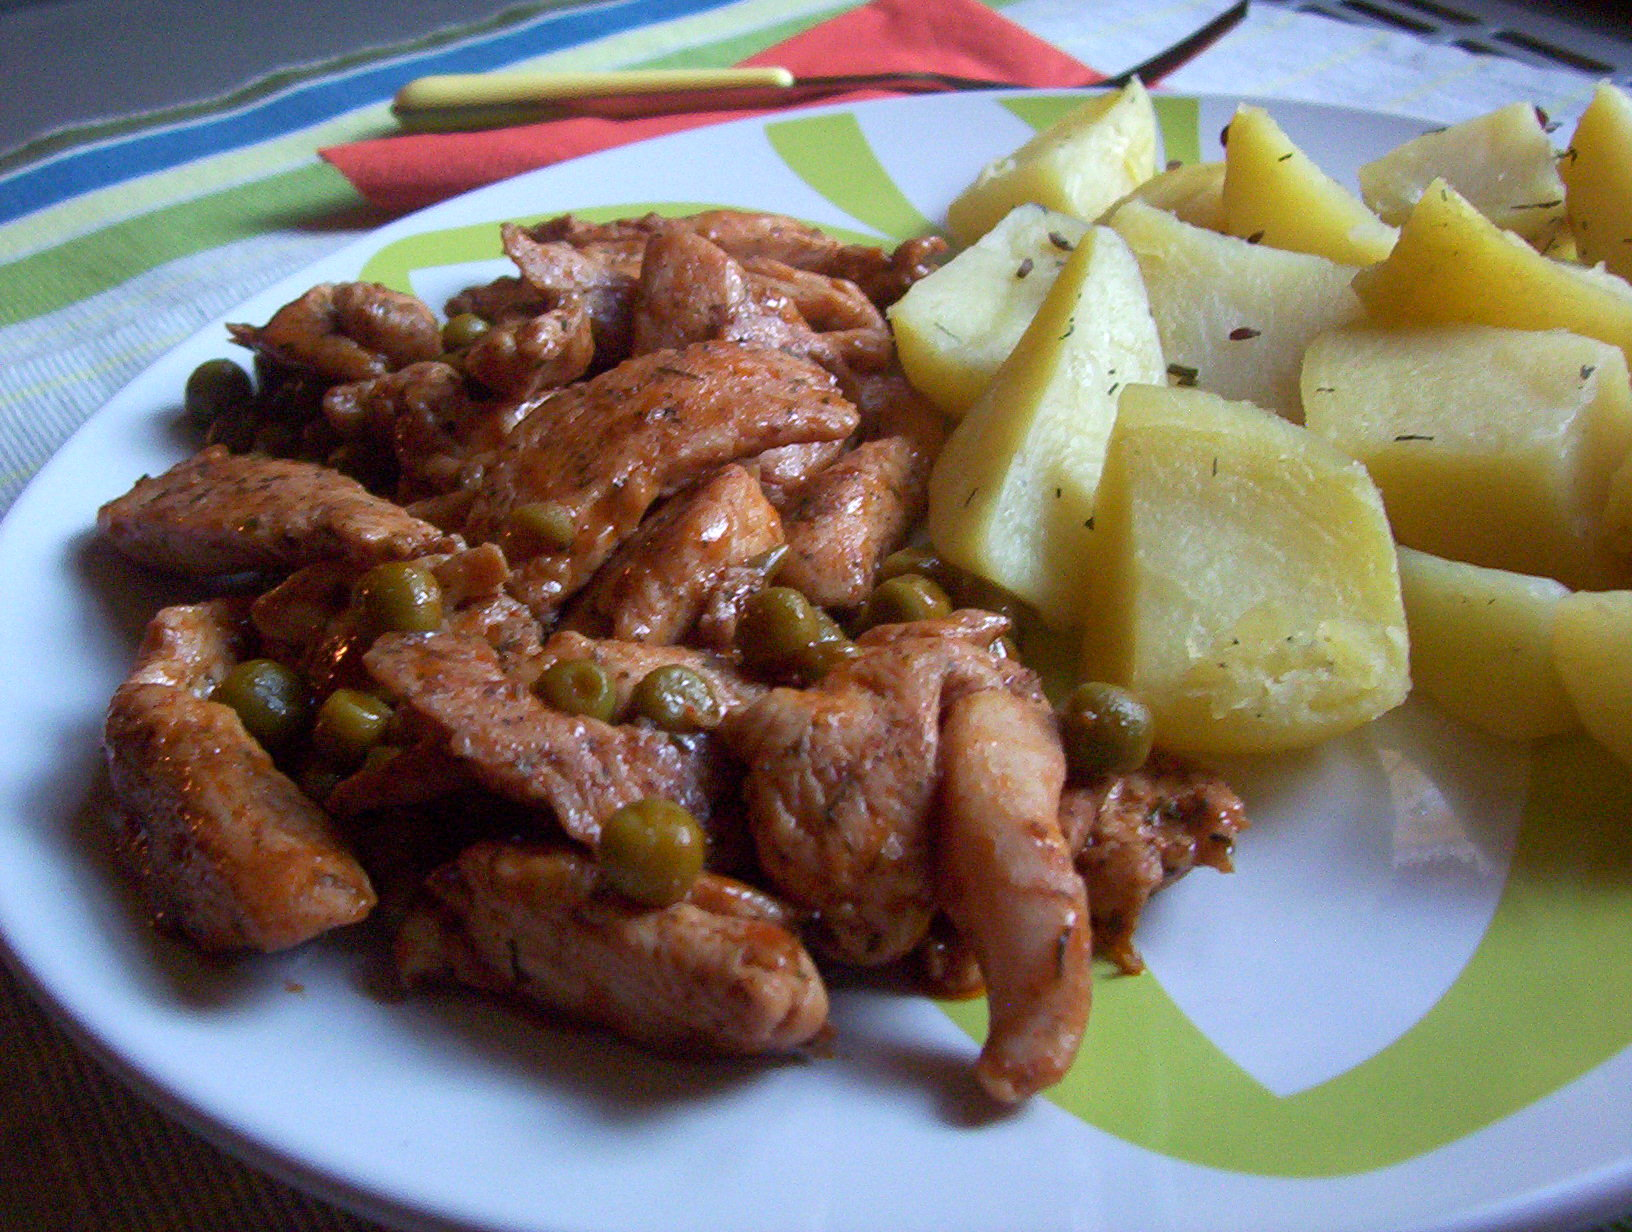 Adžika kuřecí nudličky